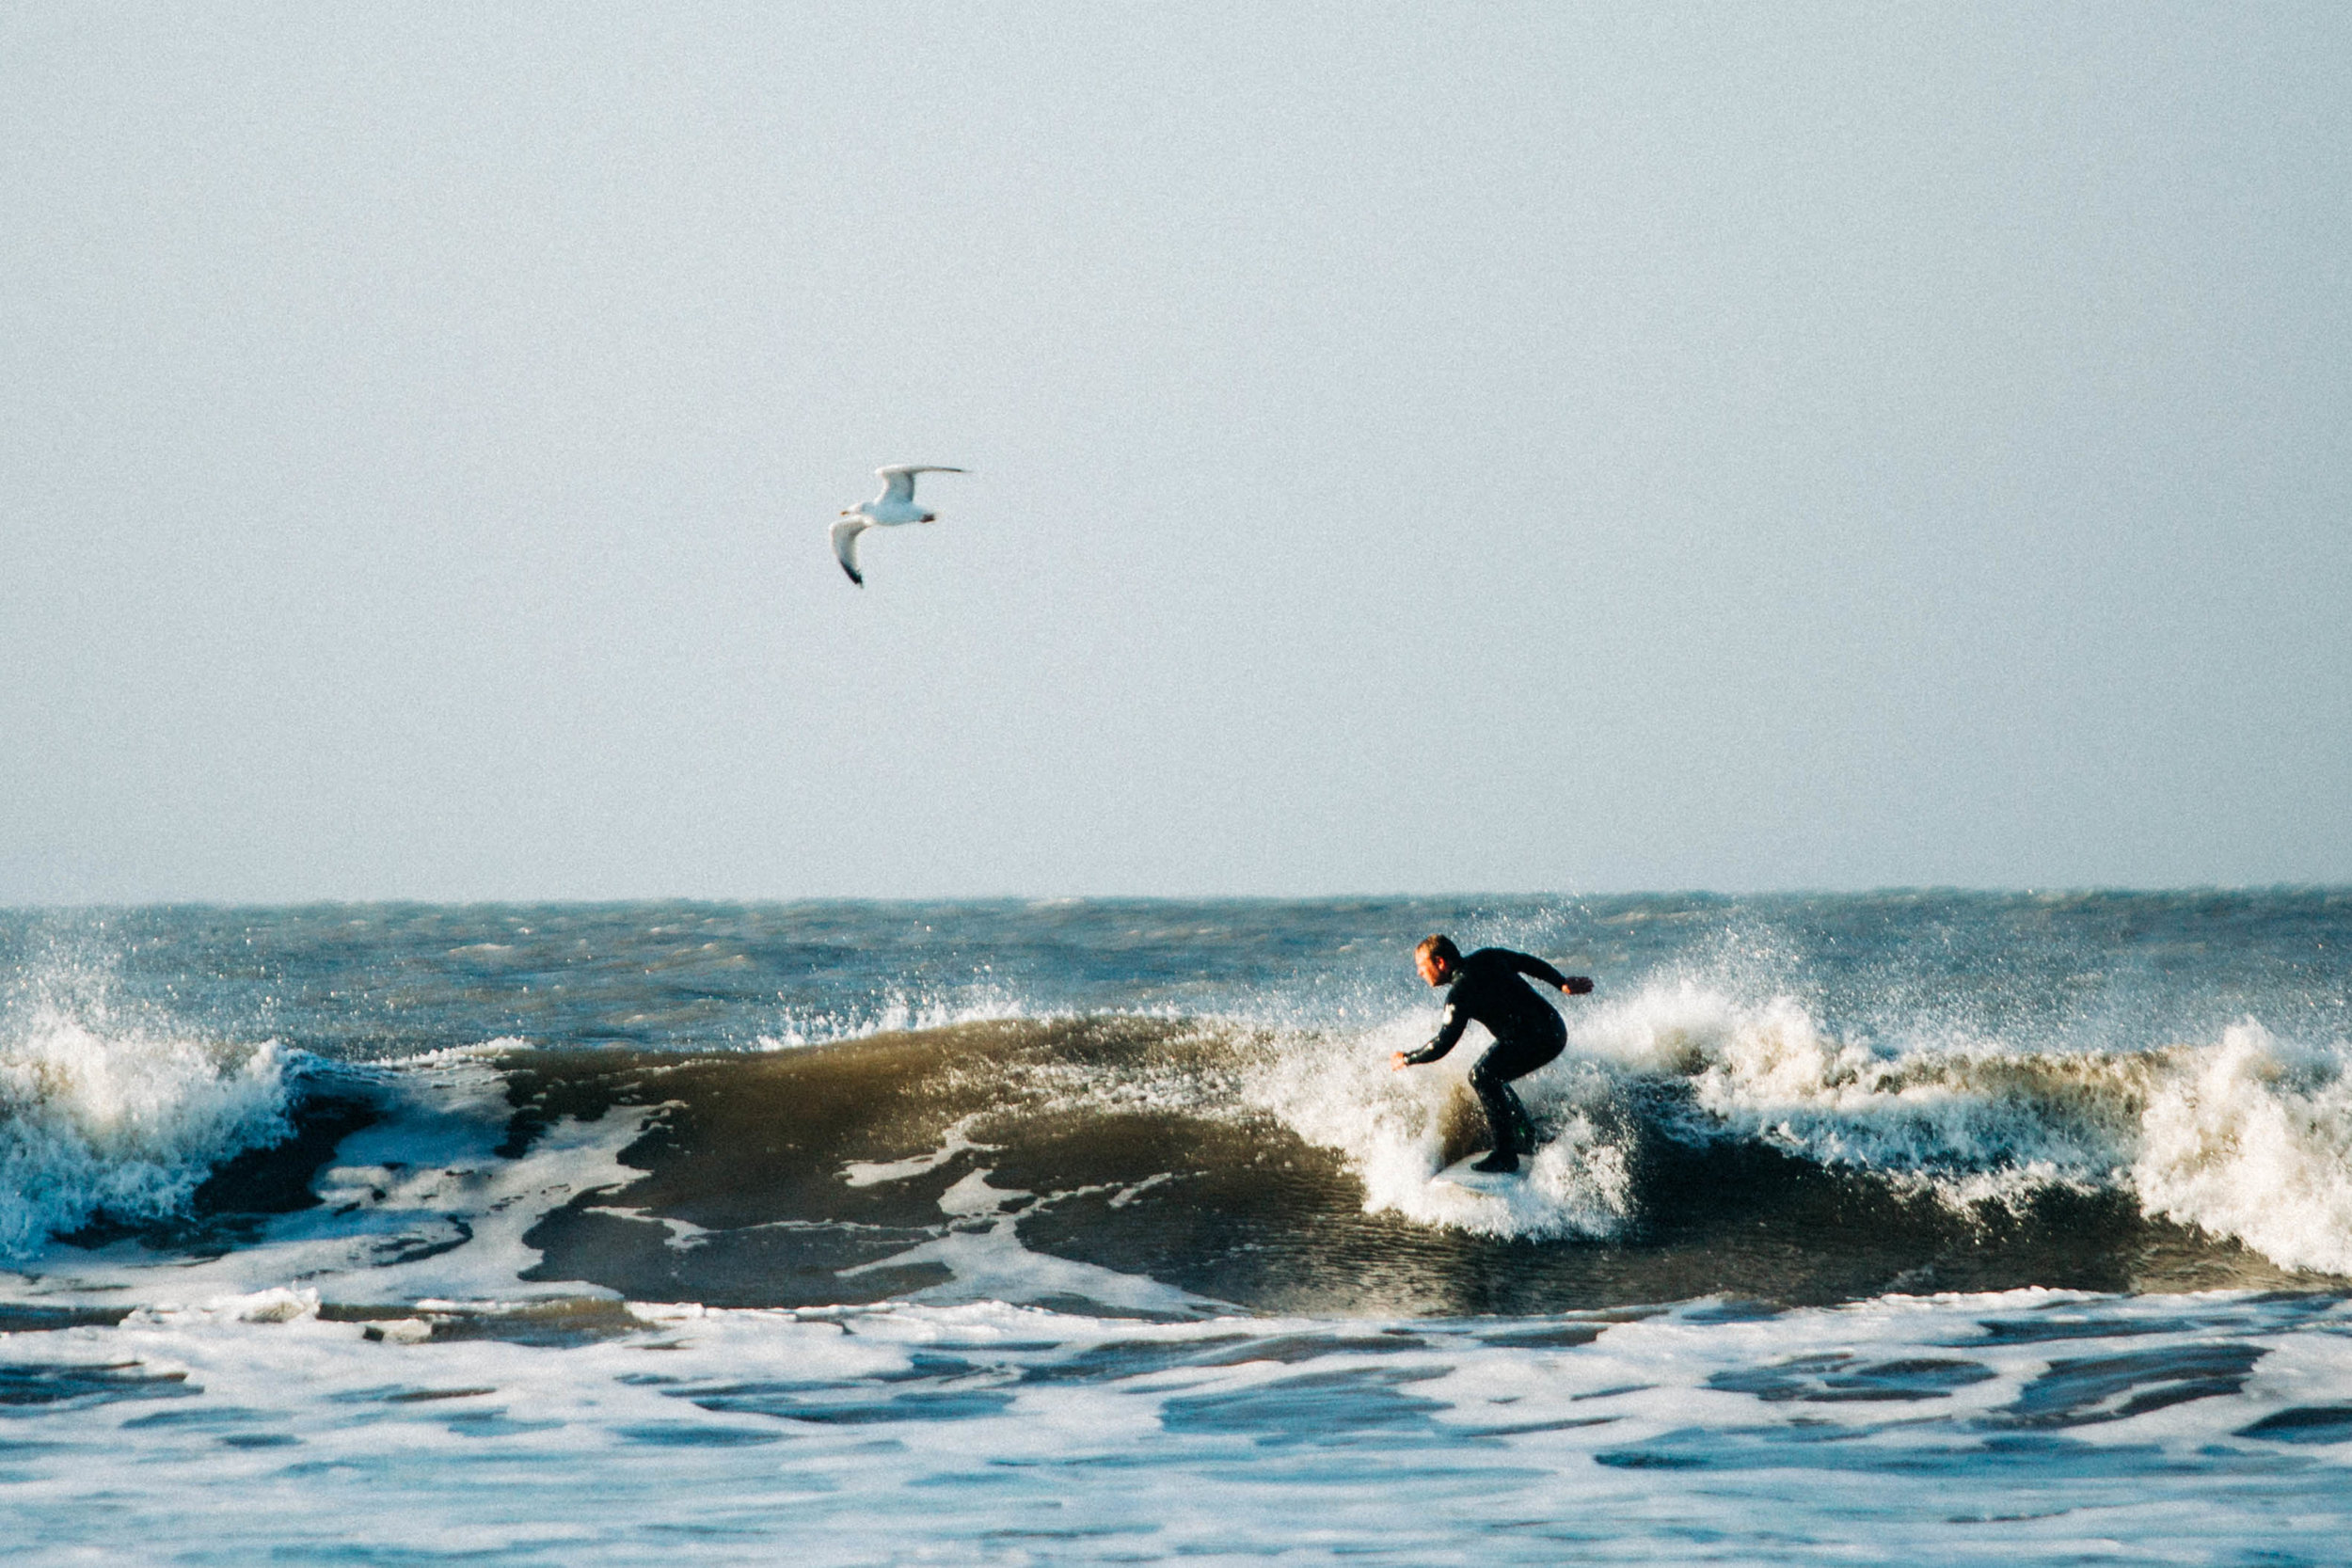 Alex_Sedgmond_Photography-Cardiff-SouthWales-PorthcawlRestbay-Surfing-EzraHames-25.jpg